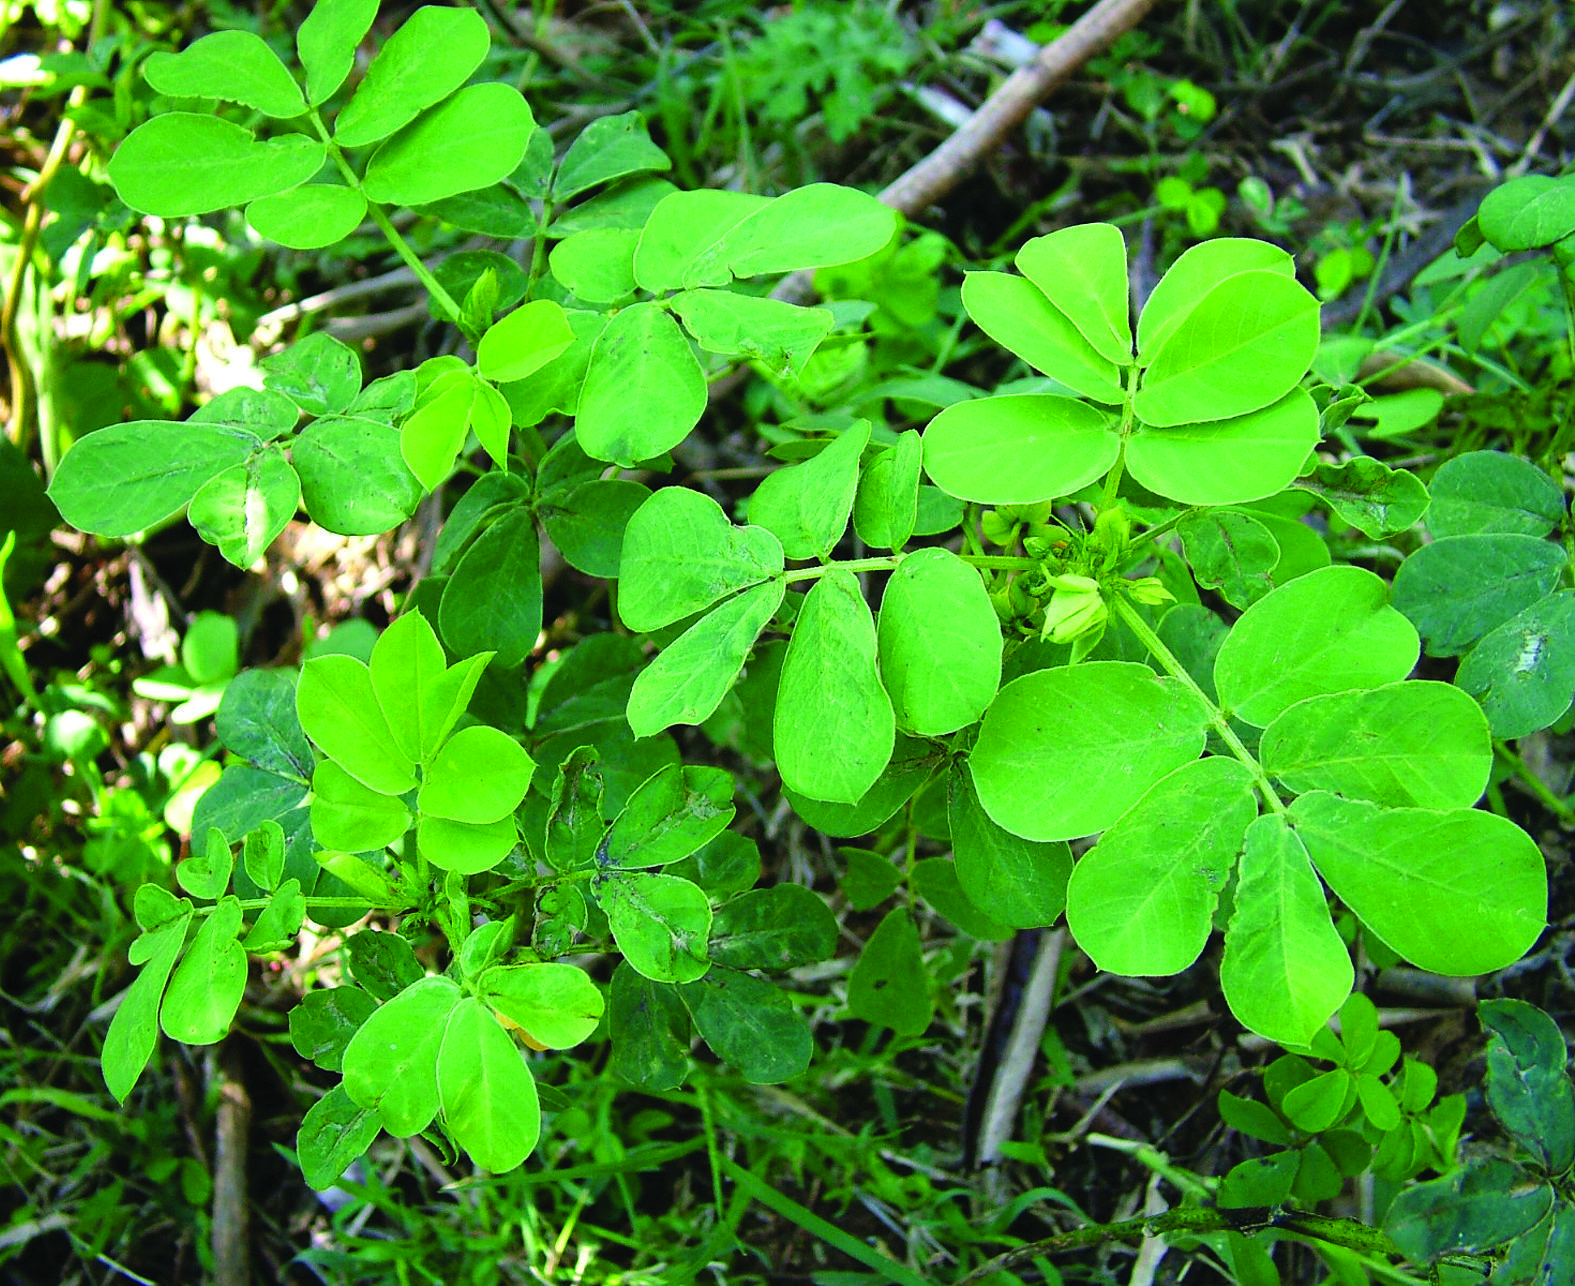 Stinking-Cassia-plant-growing-wild